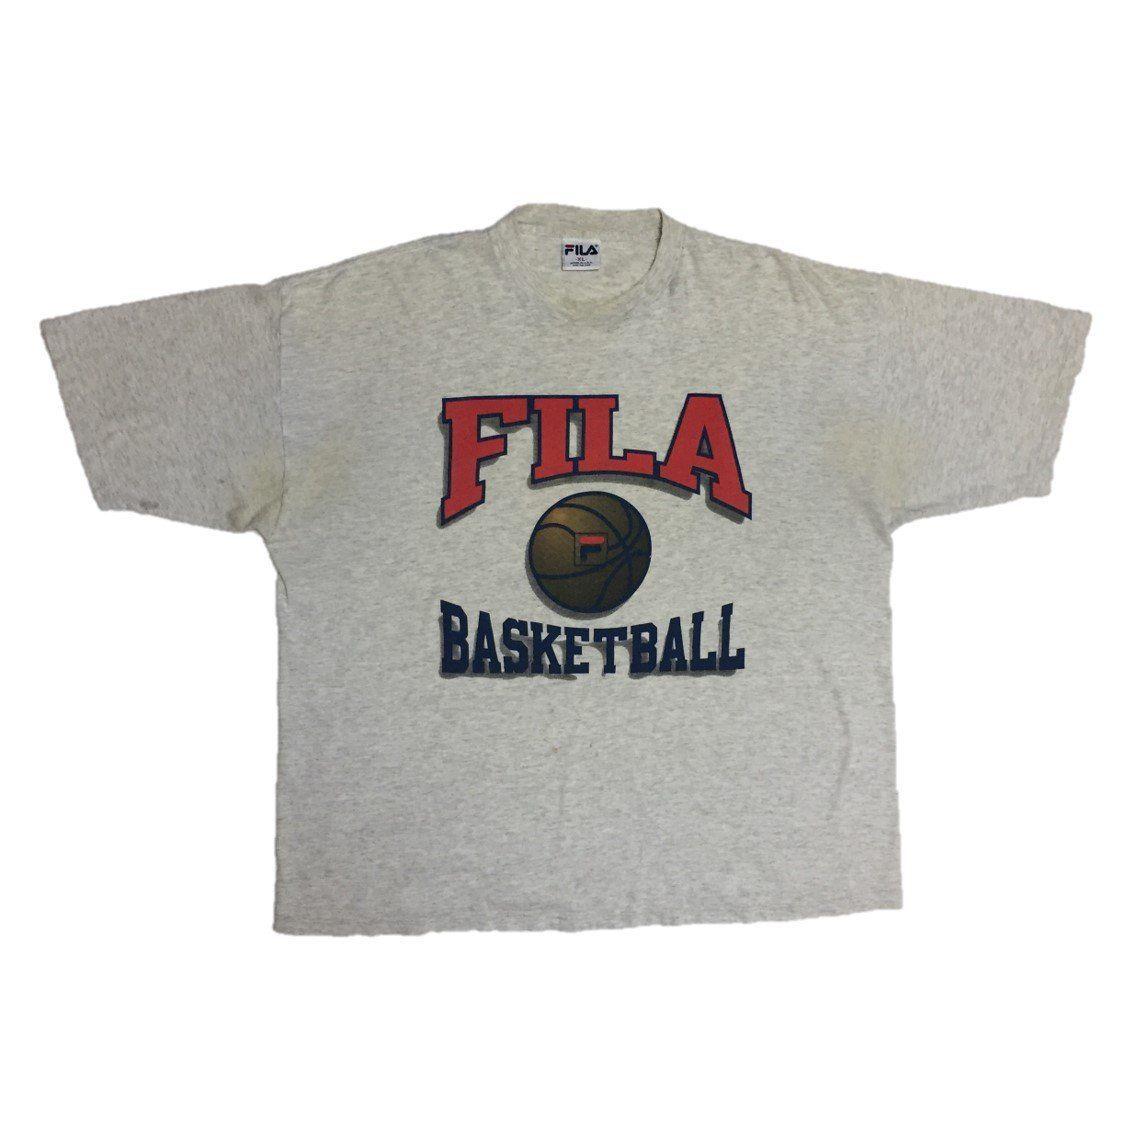 90s FILA Basketball T-Shirt. X-Large. Made in USA.